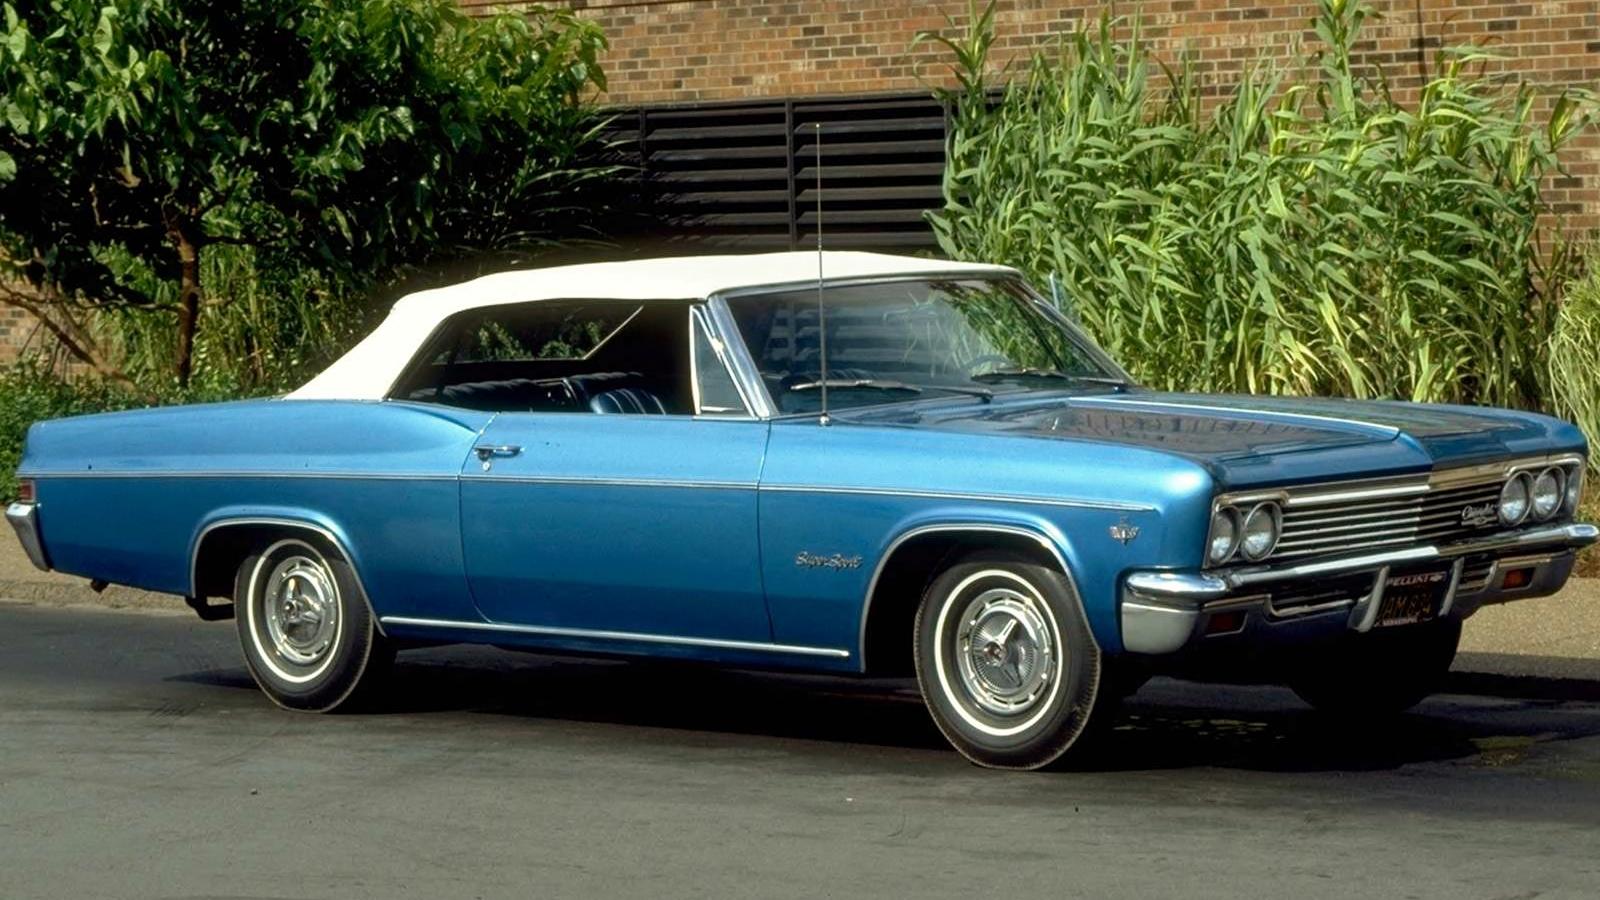 car wallpapers in good images 1966 chevrolet impala super sport. Black Bedroom Furniture Sets. Home Design Ideas